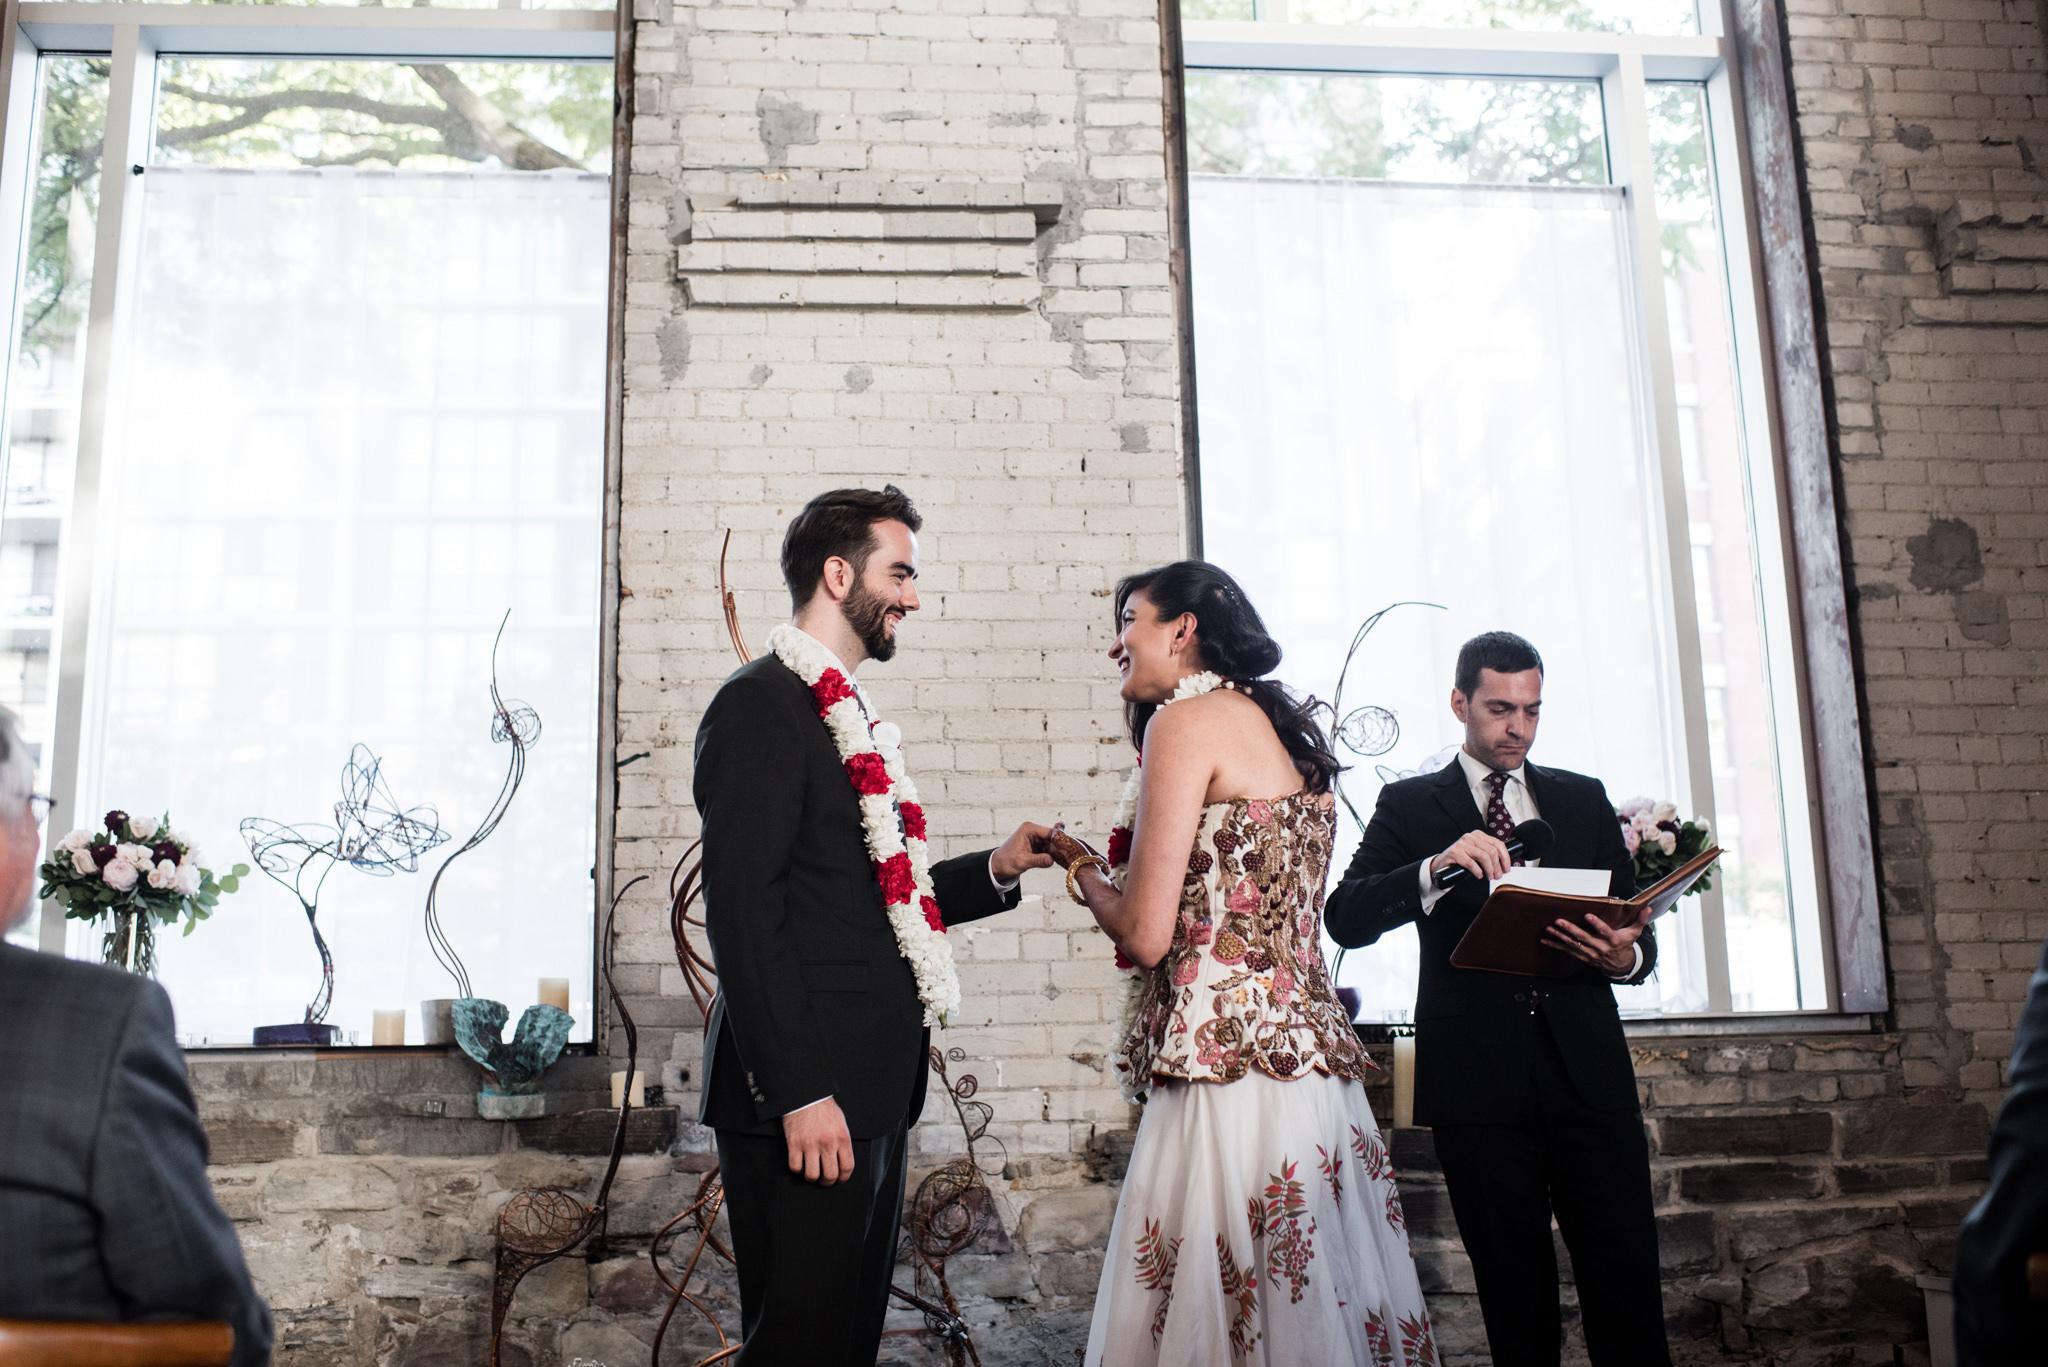 071-ring-wedding-bride-groom-ceremony-toronto-downtown-photos.jpg